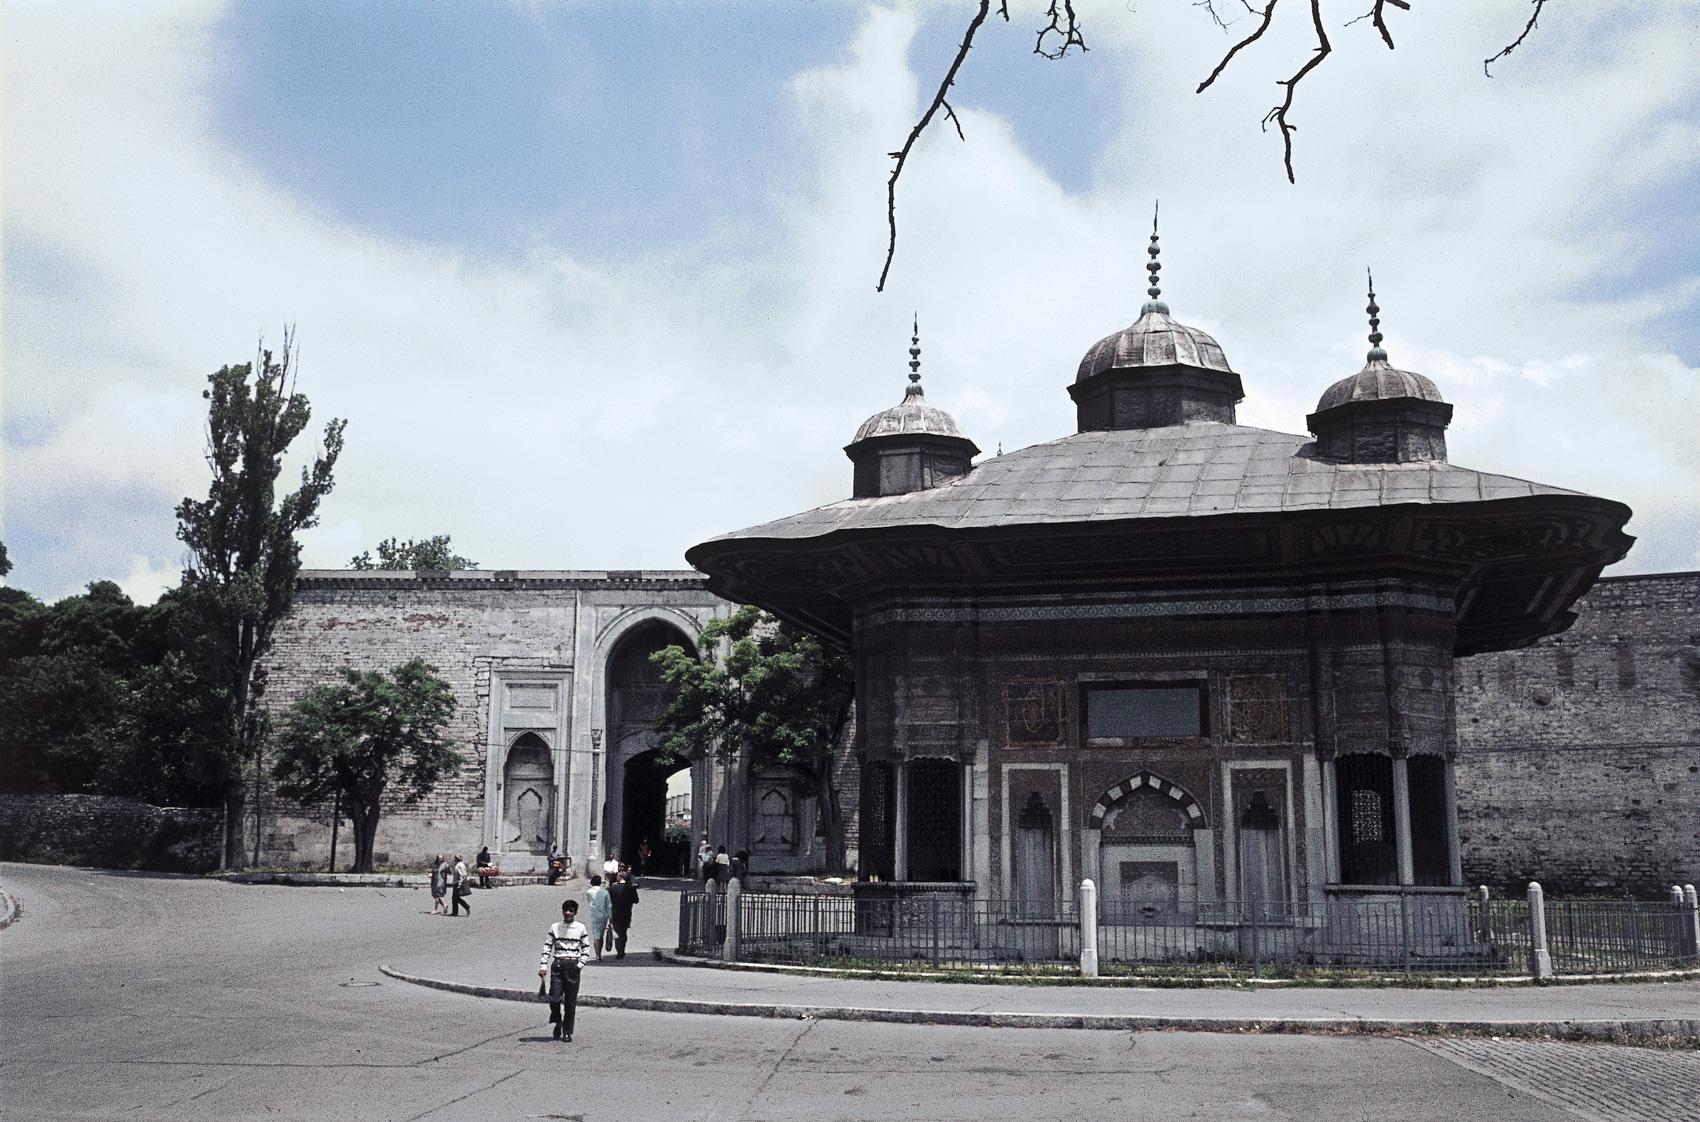 1728Ahmed-III_s-broend-ved-Topkapi-paladset_-Istanbul_-Tyrkiet.-HMH.jpg